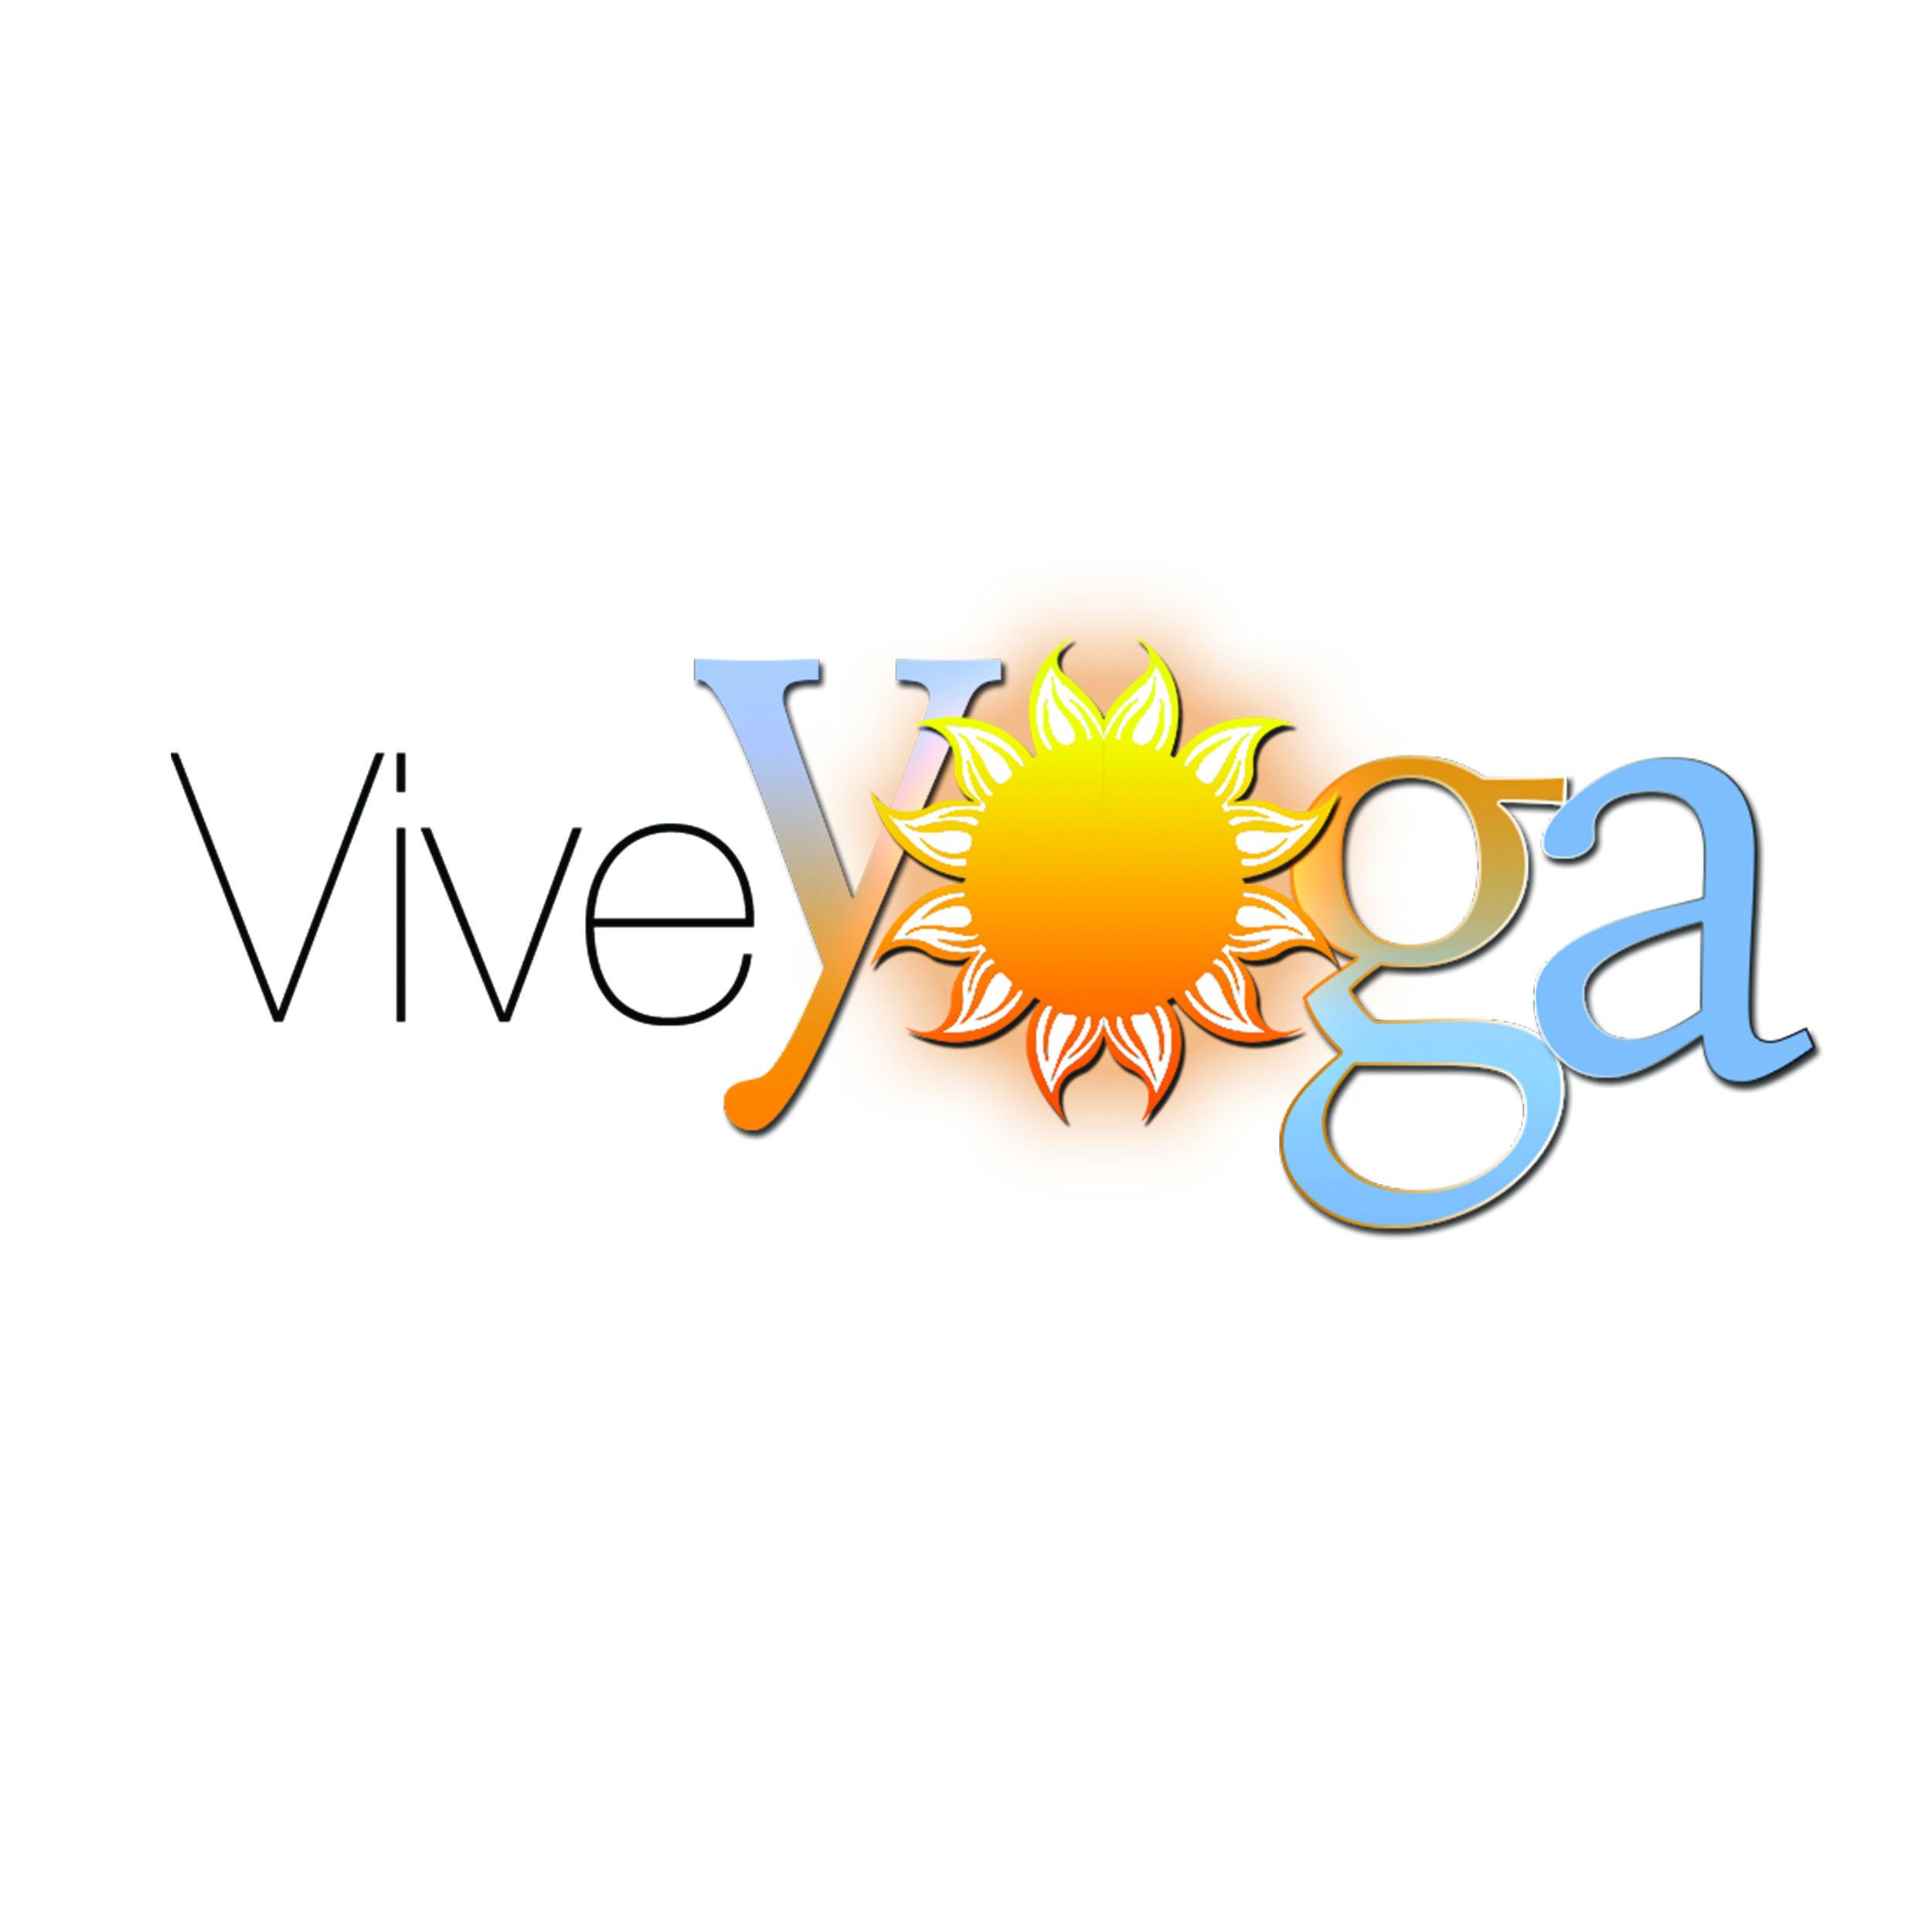 vive yoga 2.jpg